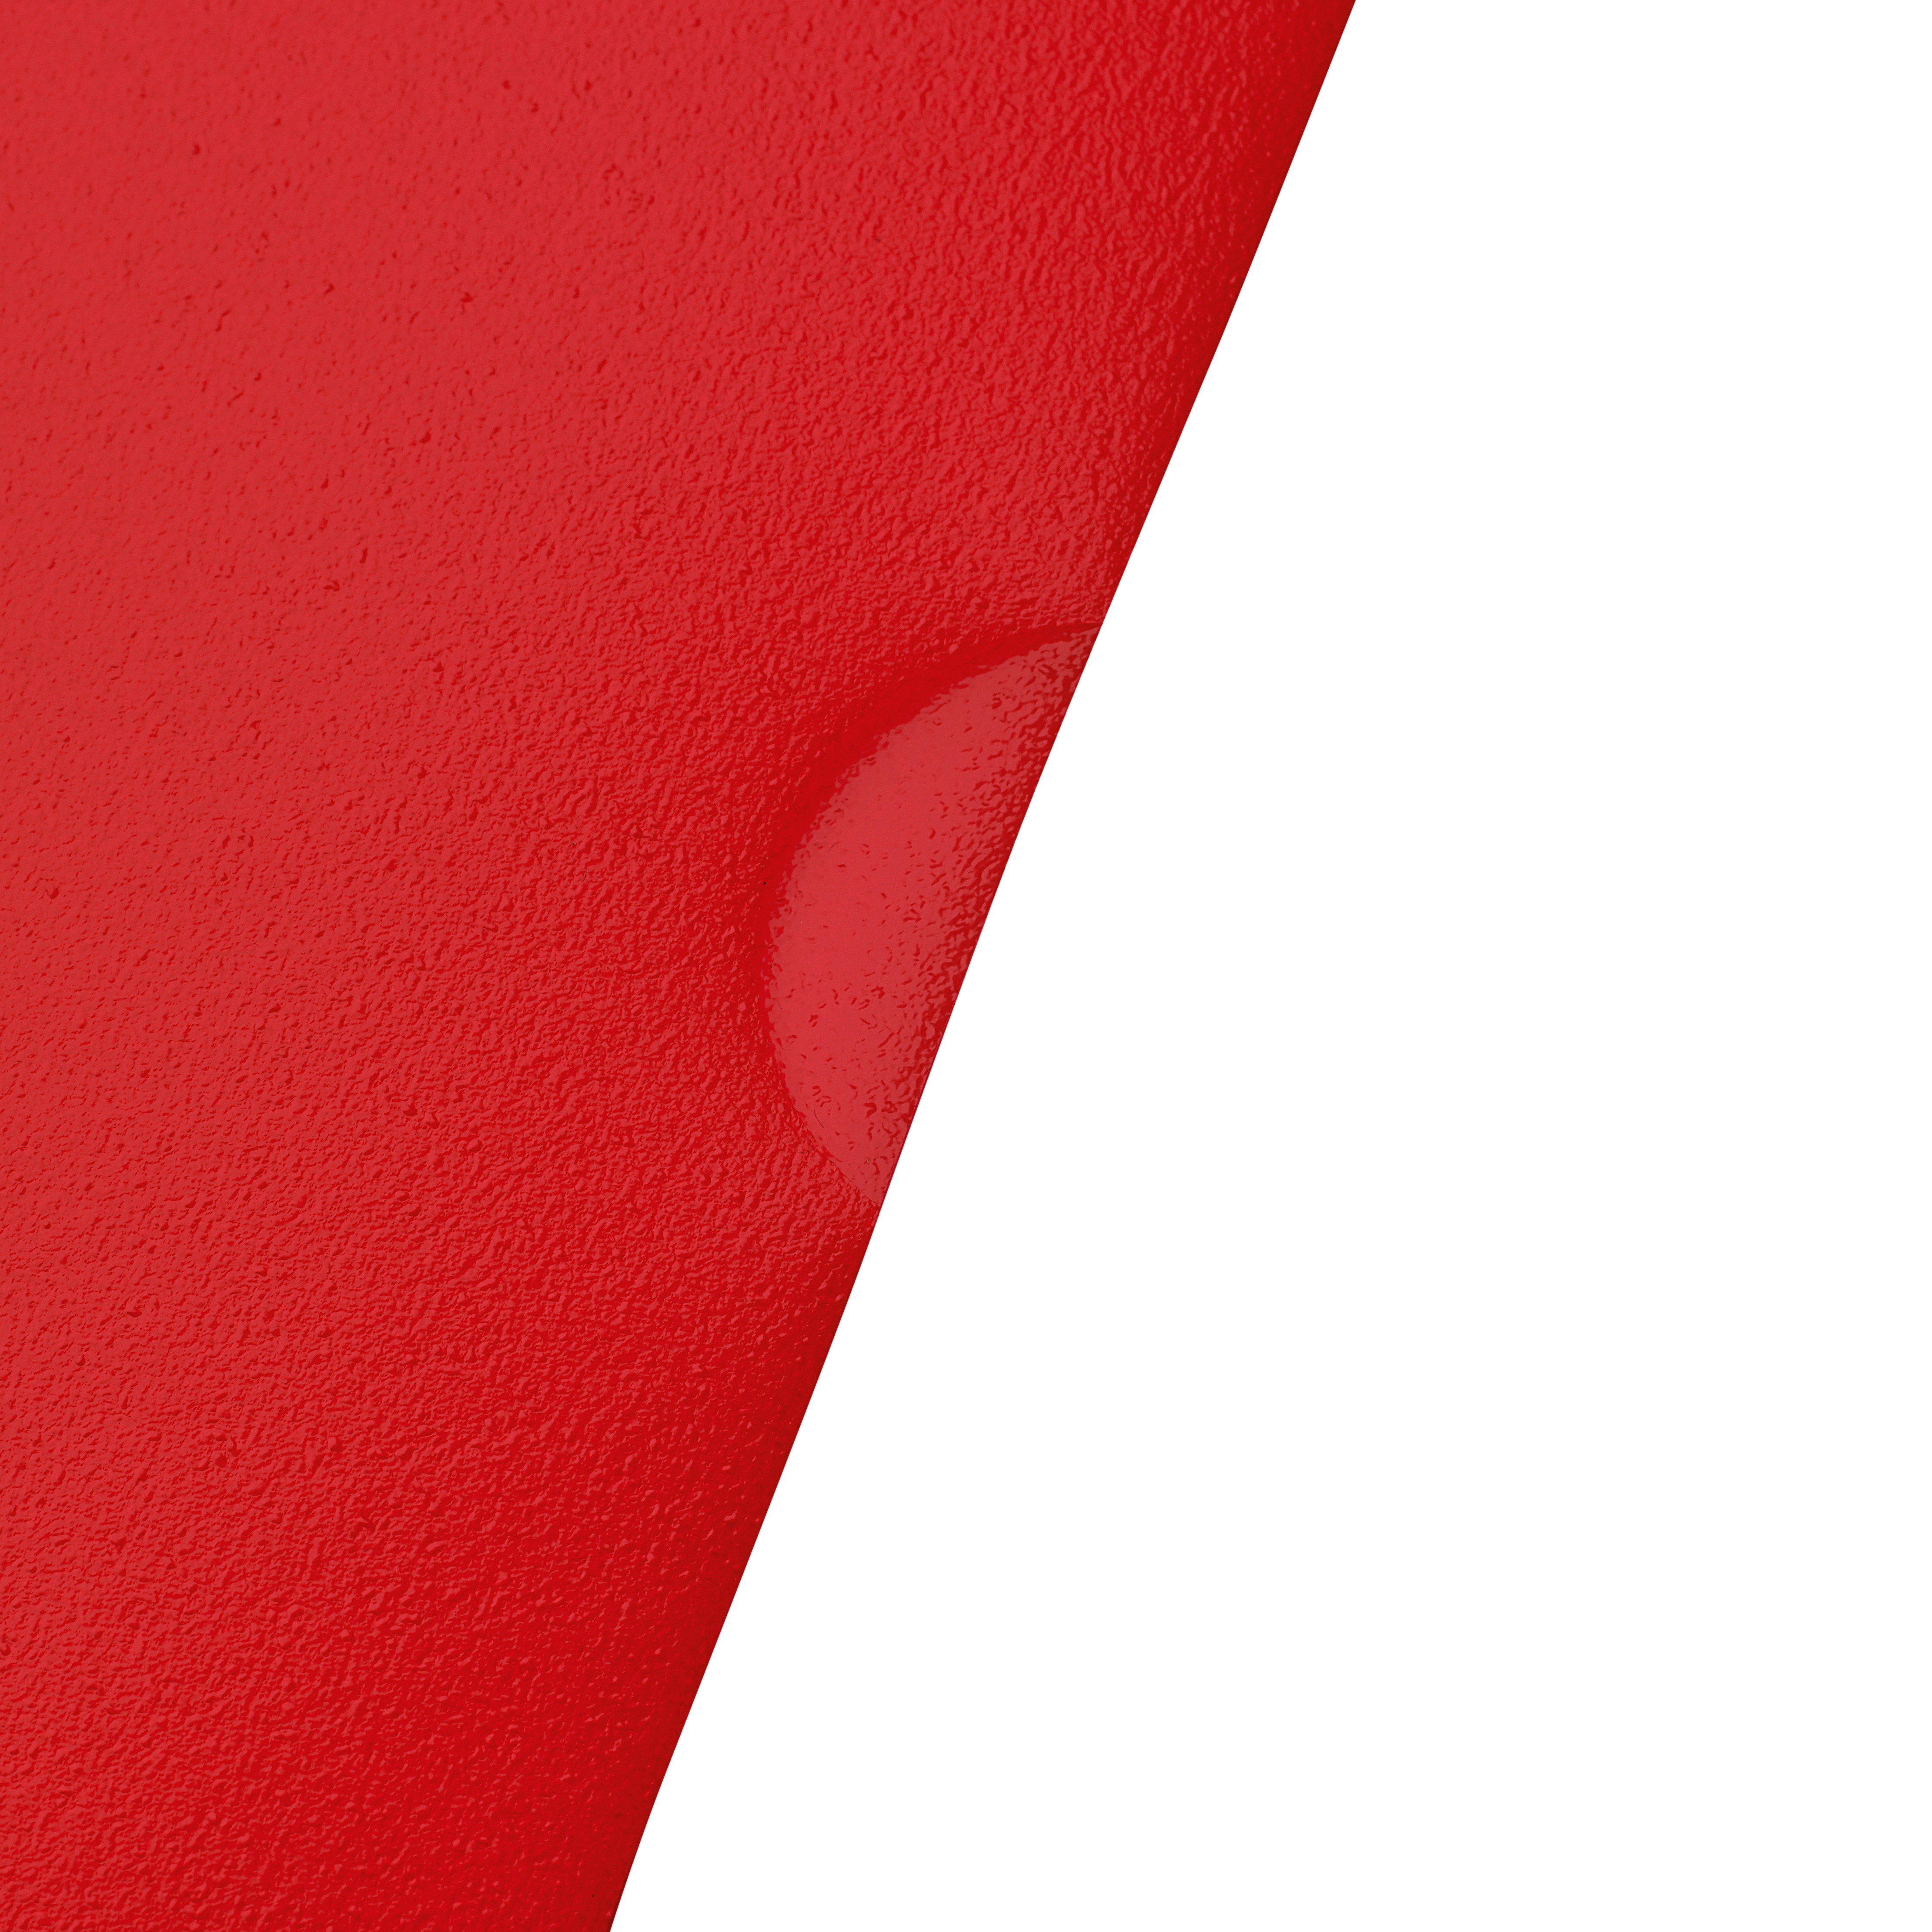 5 Star Office Folder Embossed Cut Flush Polypropylene Copy-safe Translucent 110 Micron A4 Red [Pack 25]